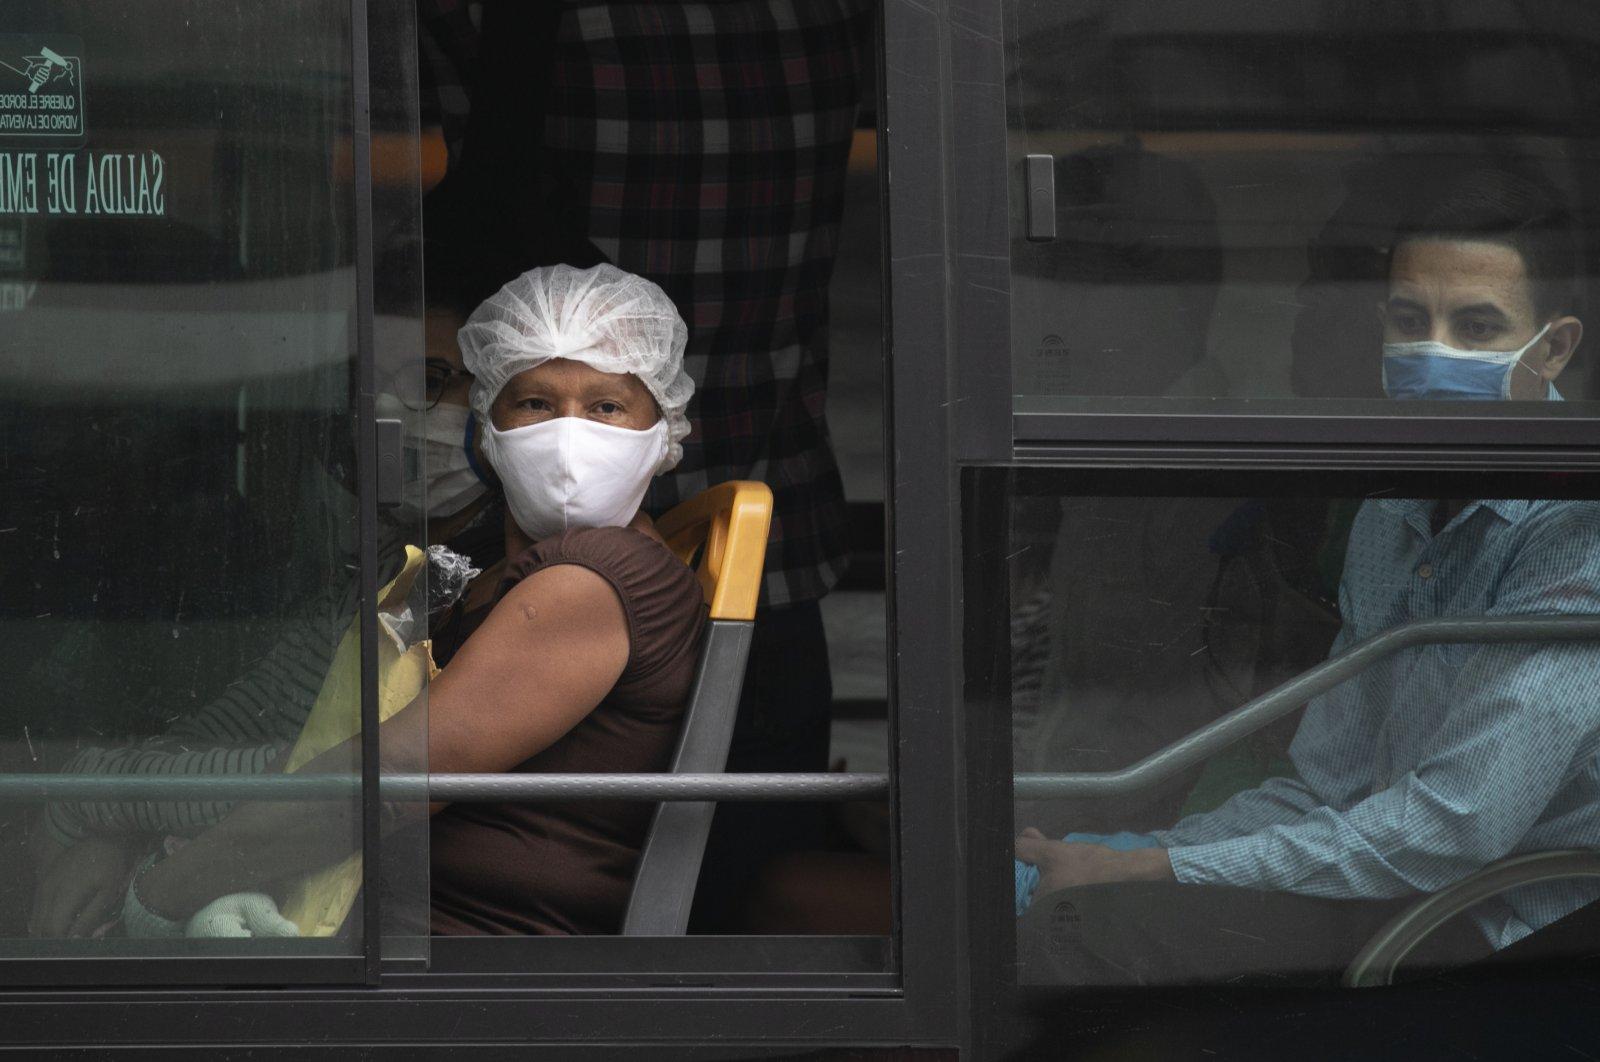 Commuters wearing face masks due to the new coronavirus pandemic ride buses in Caracas, Venezuela, June 1, 2020. (AP Photo)